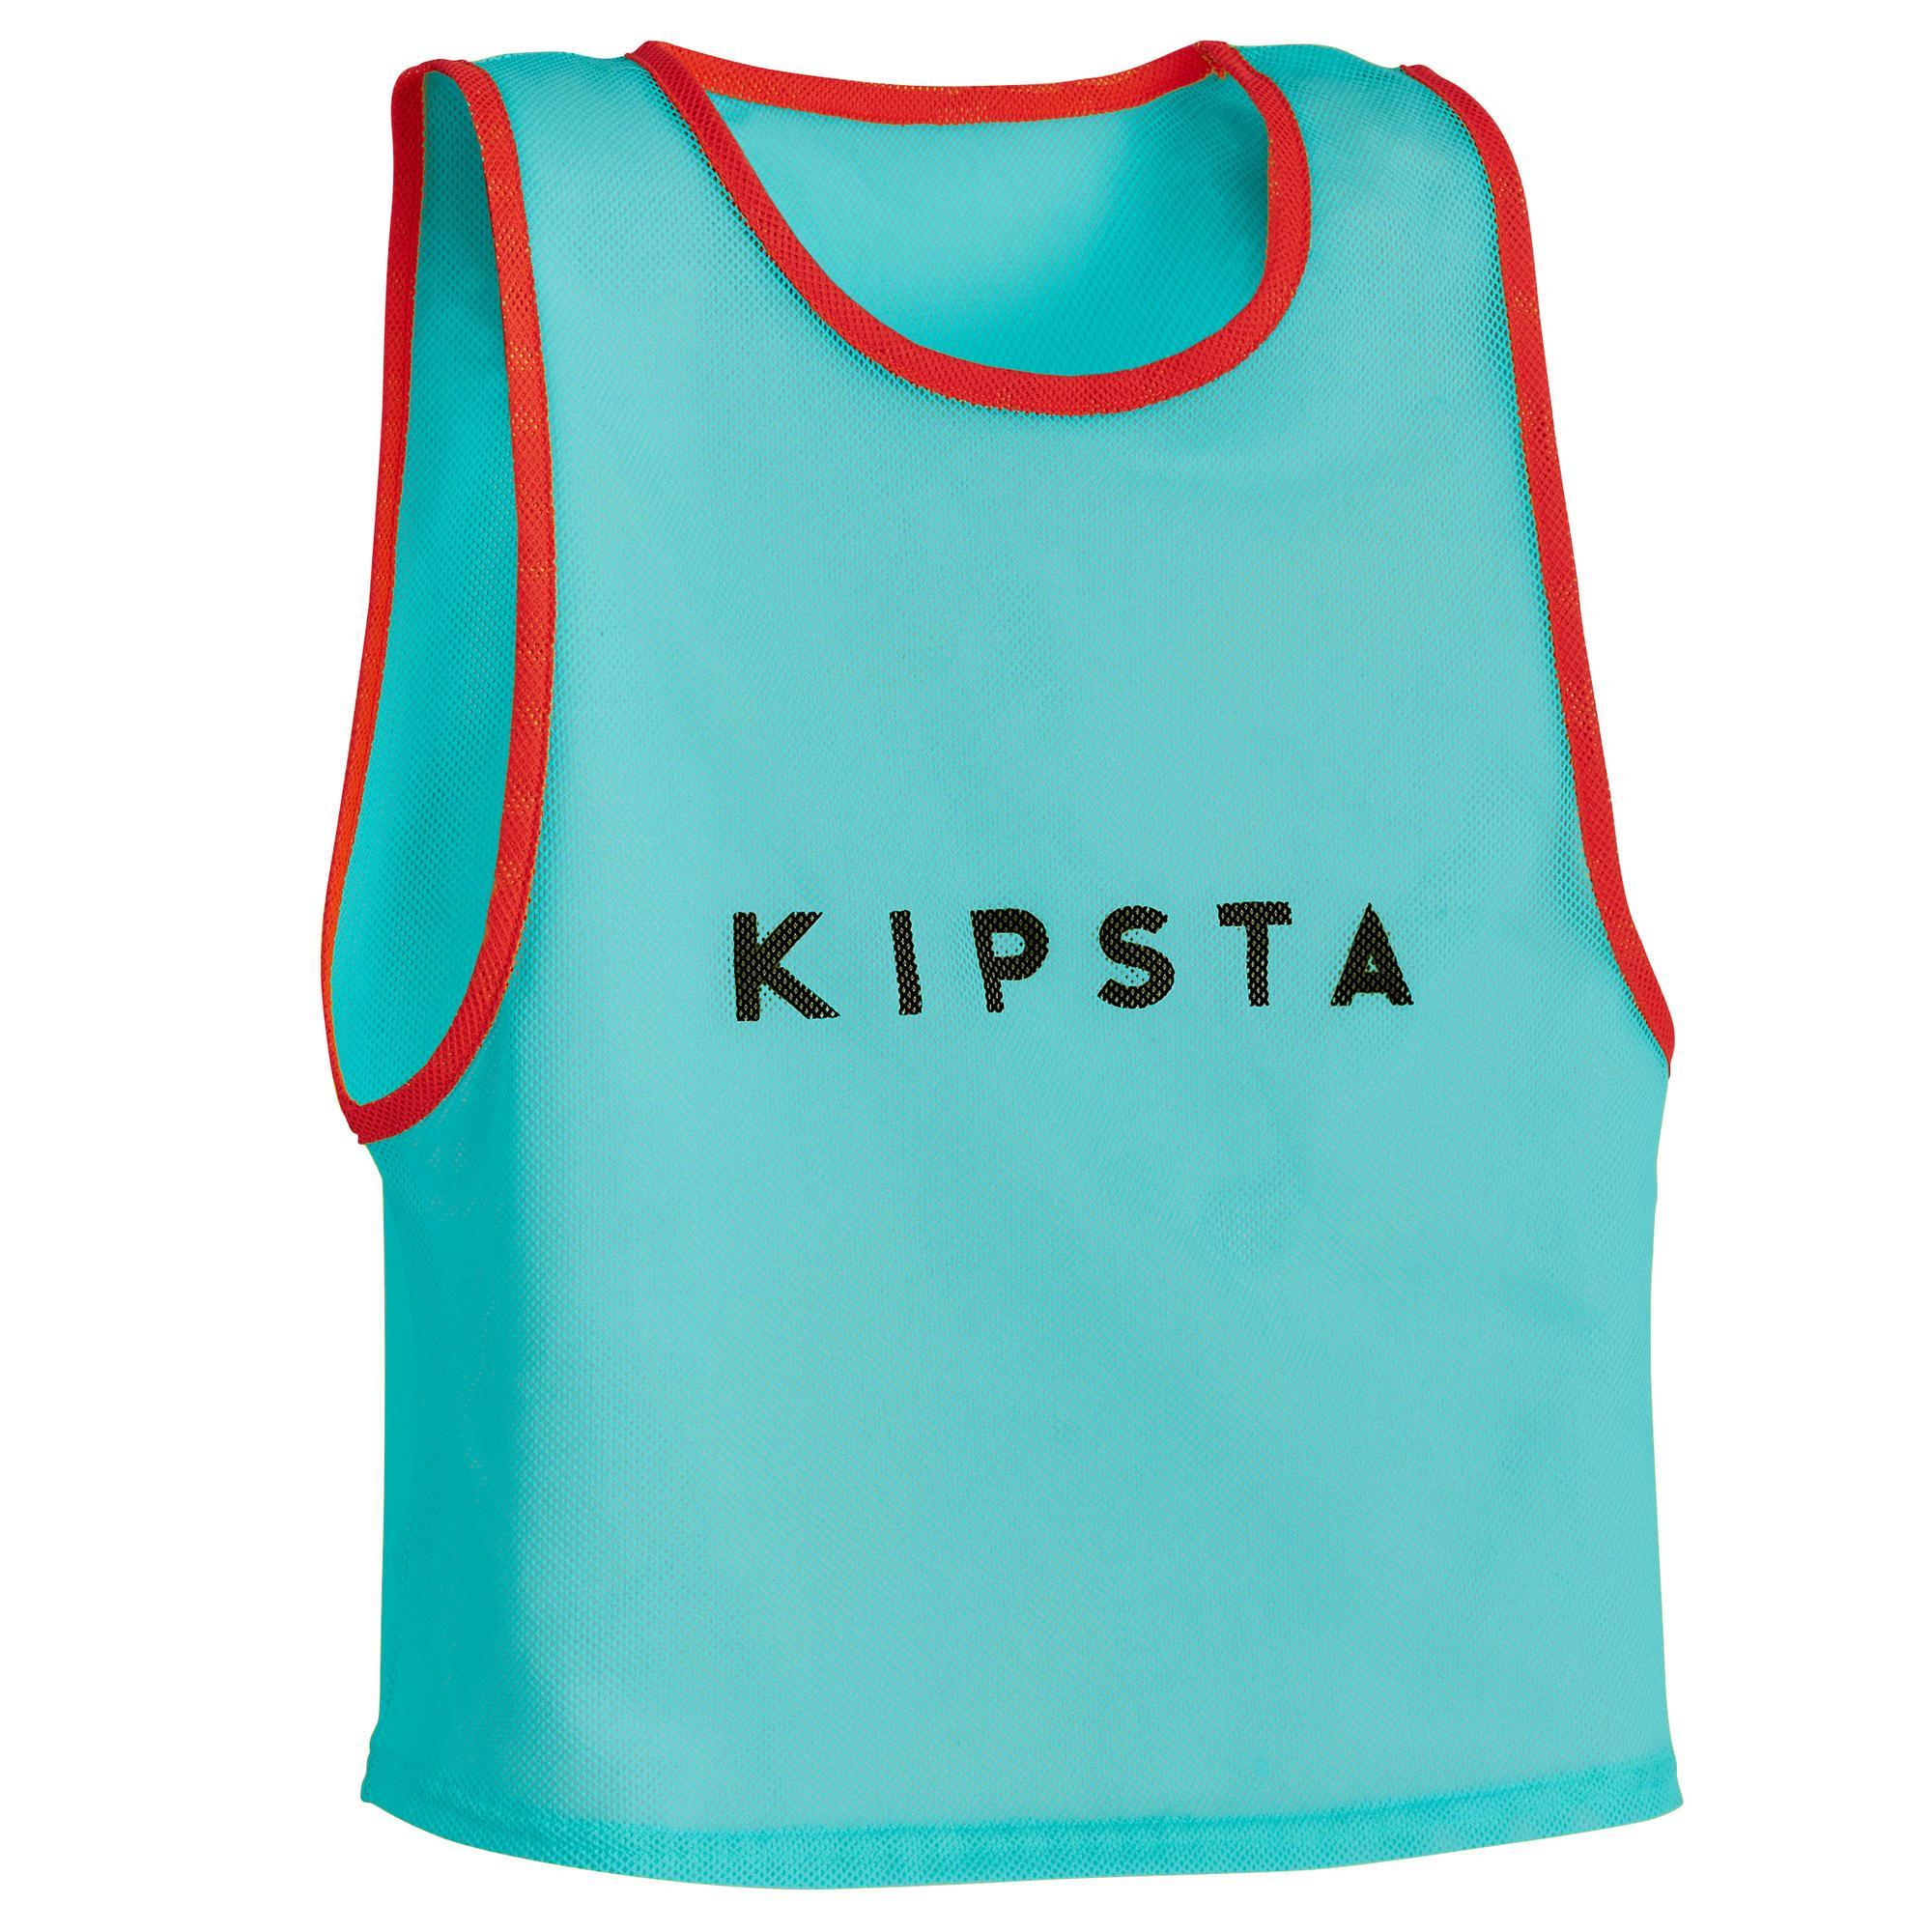 KIPSTA. Pettorina bambino turchese